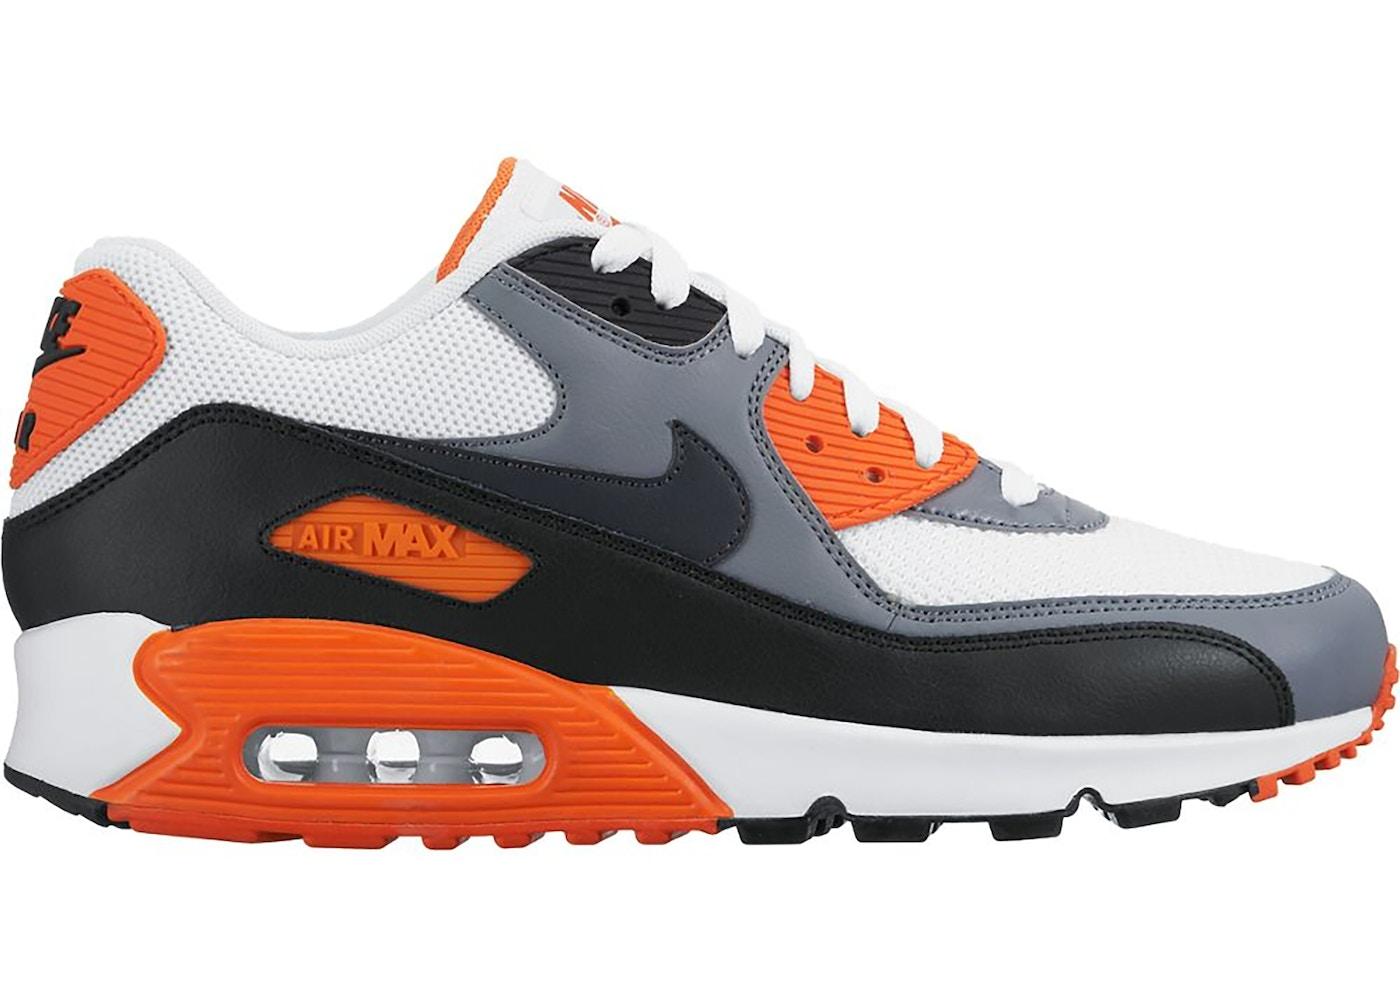 Nike Air Max 90 White Grey Orange - 537384-128